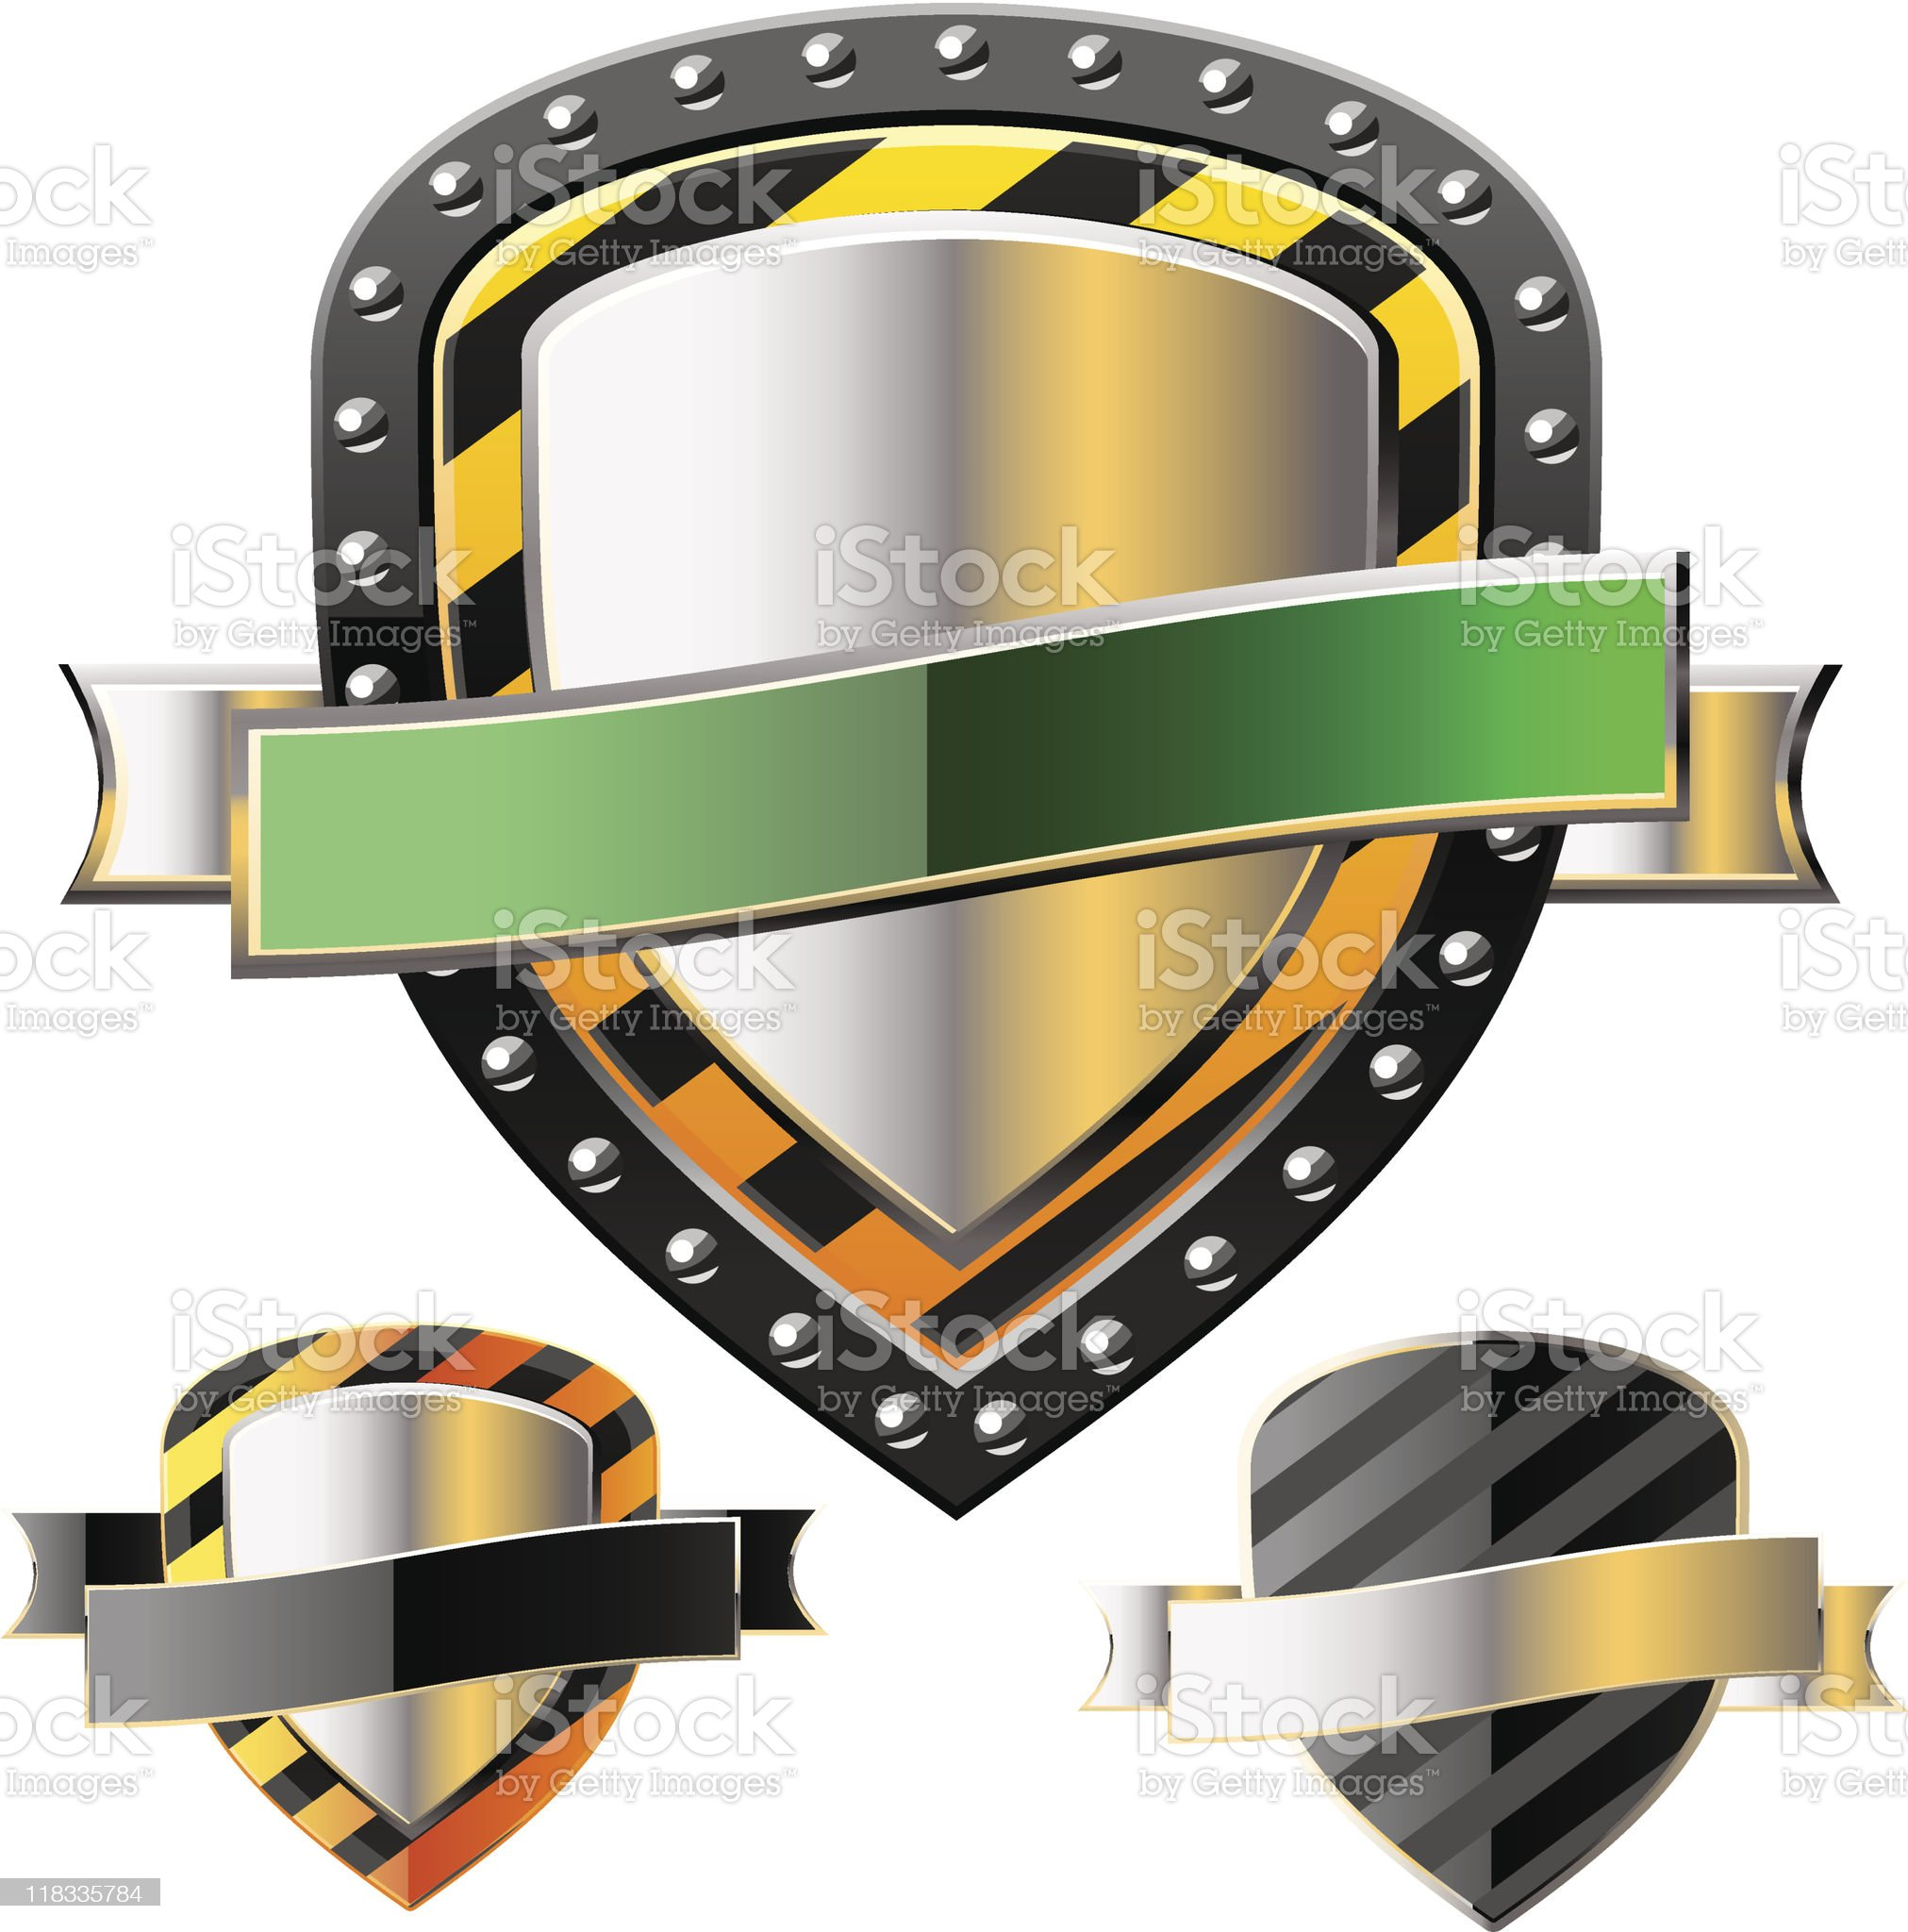 protection shield royalty-free stock vector art